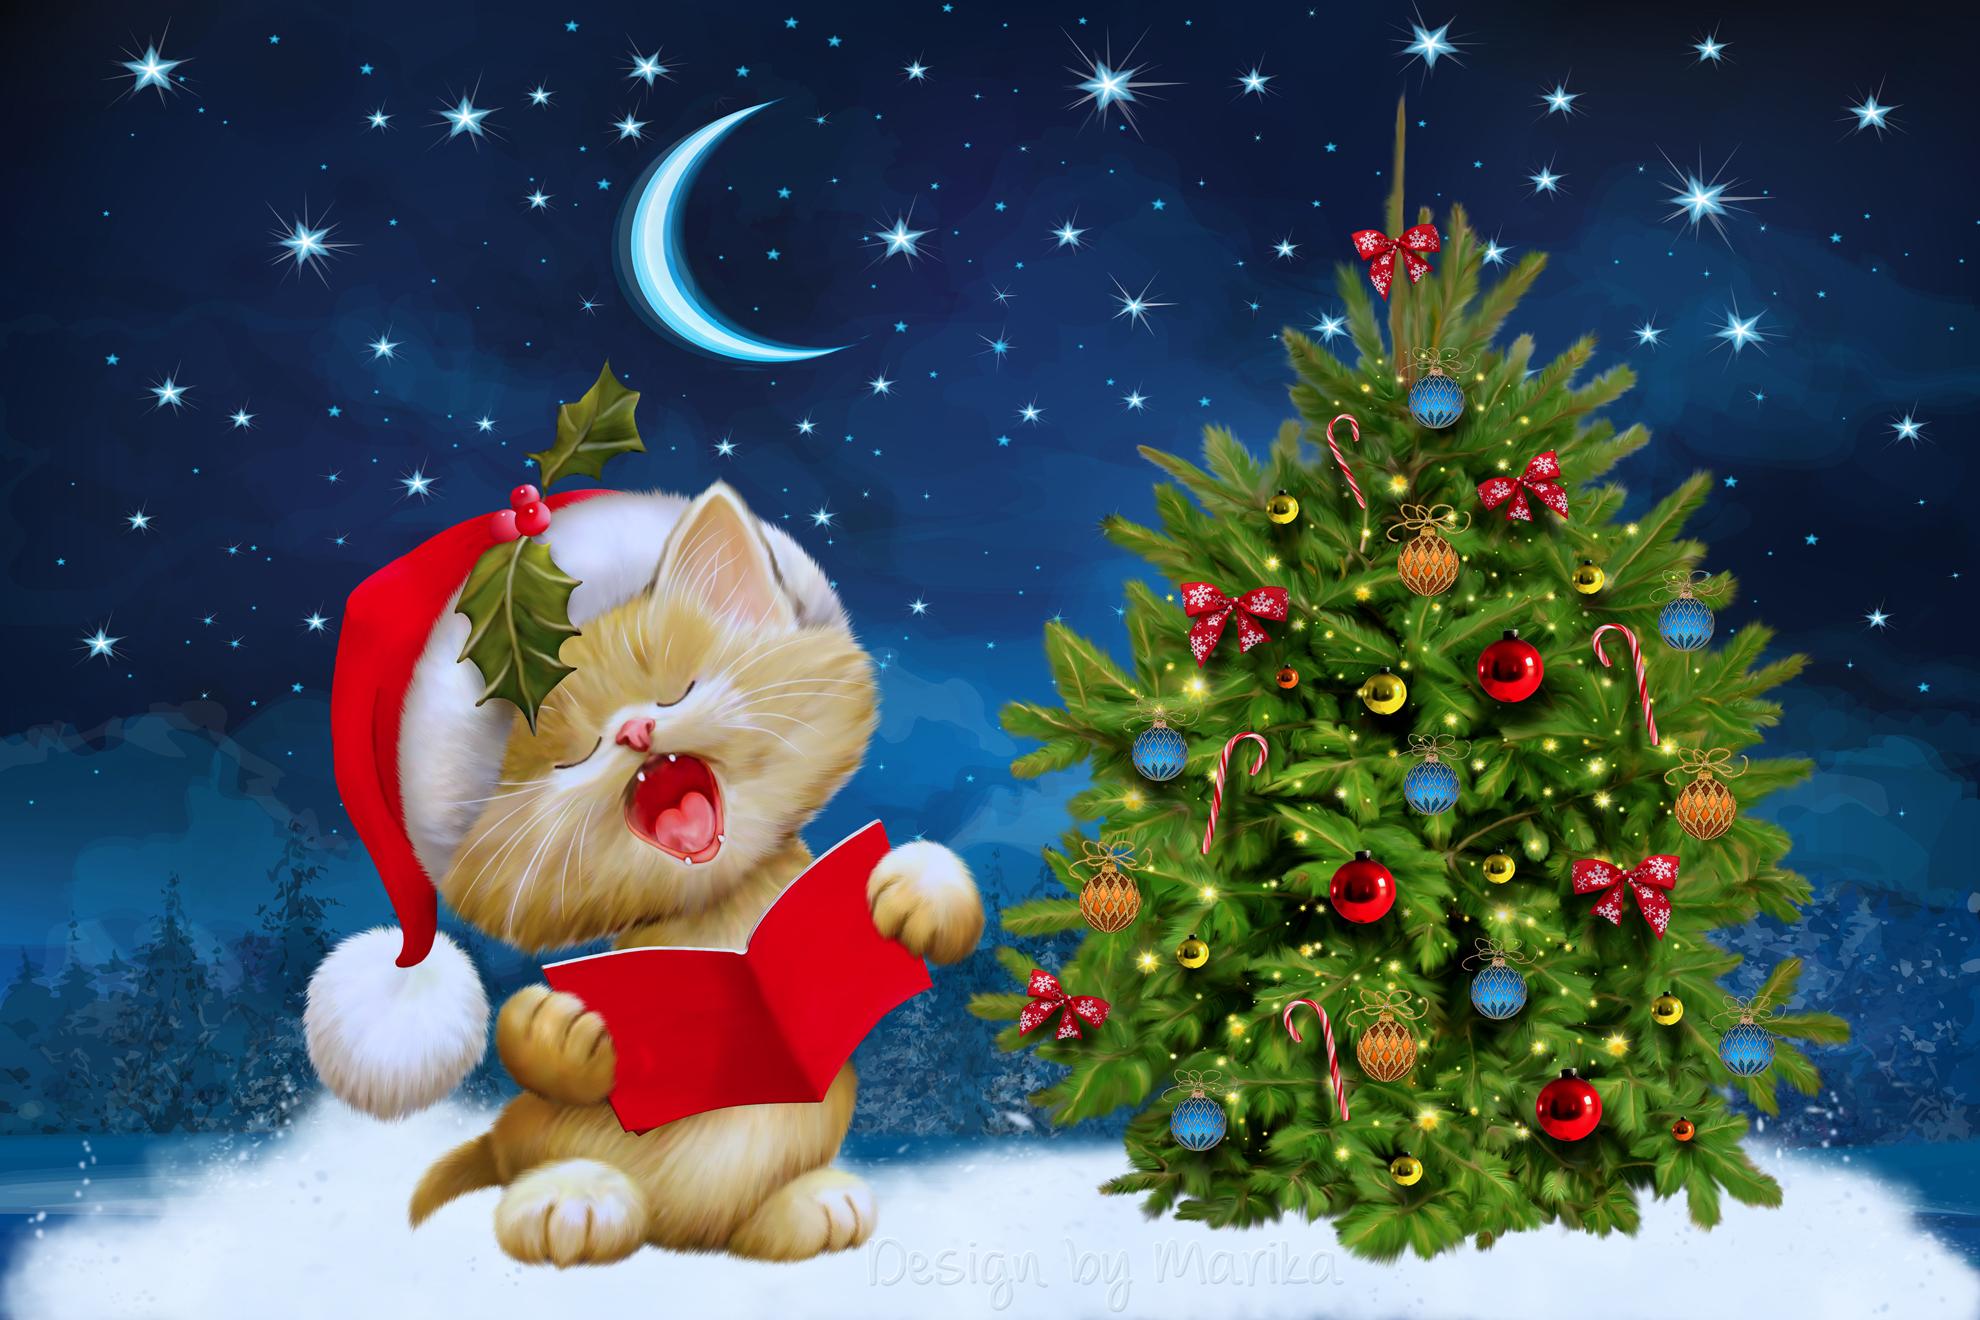 Fondos De Pantalla Navidenos: Navidad, Fondos De Navidad, Wallpapers HD